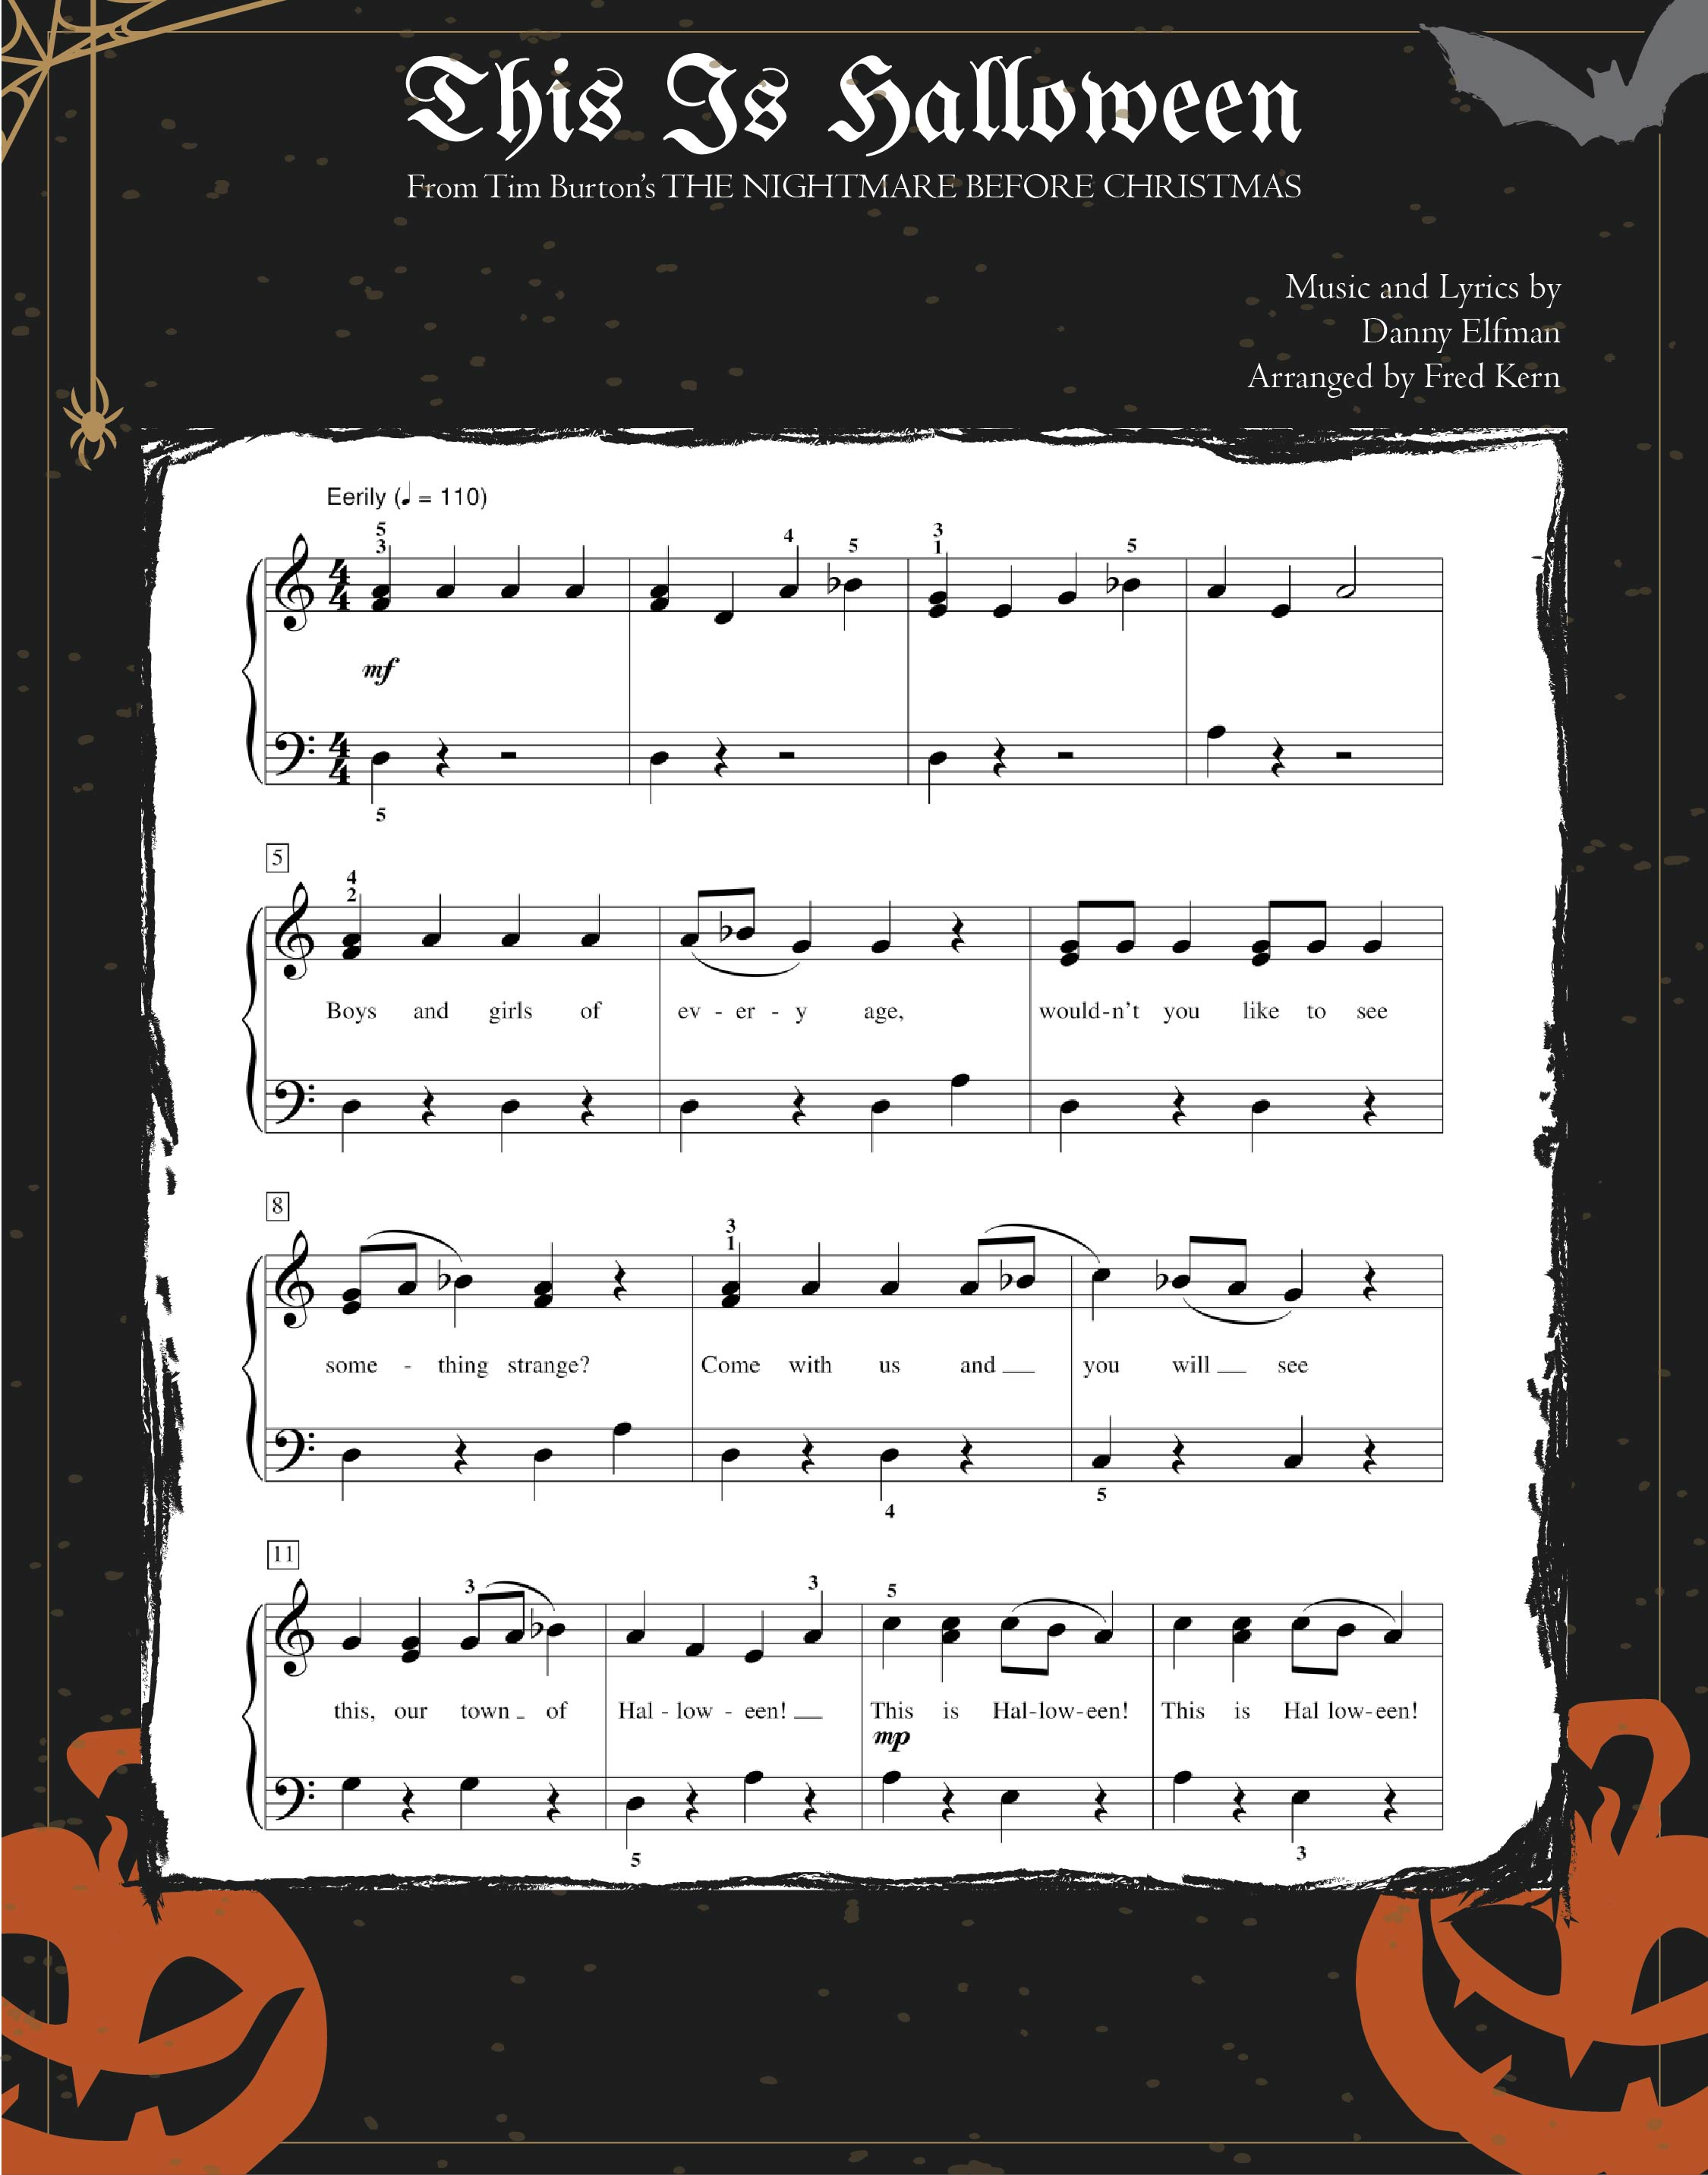 Vintage Halloween Sheet Music